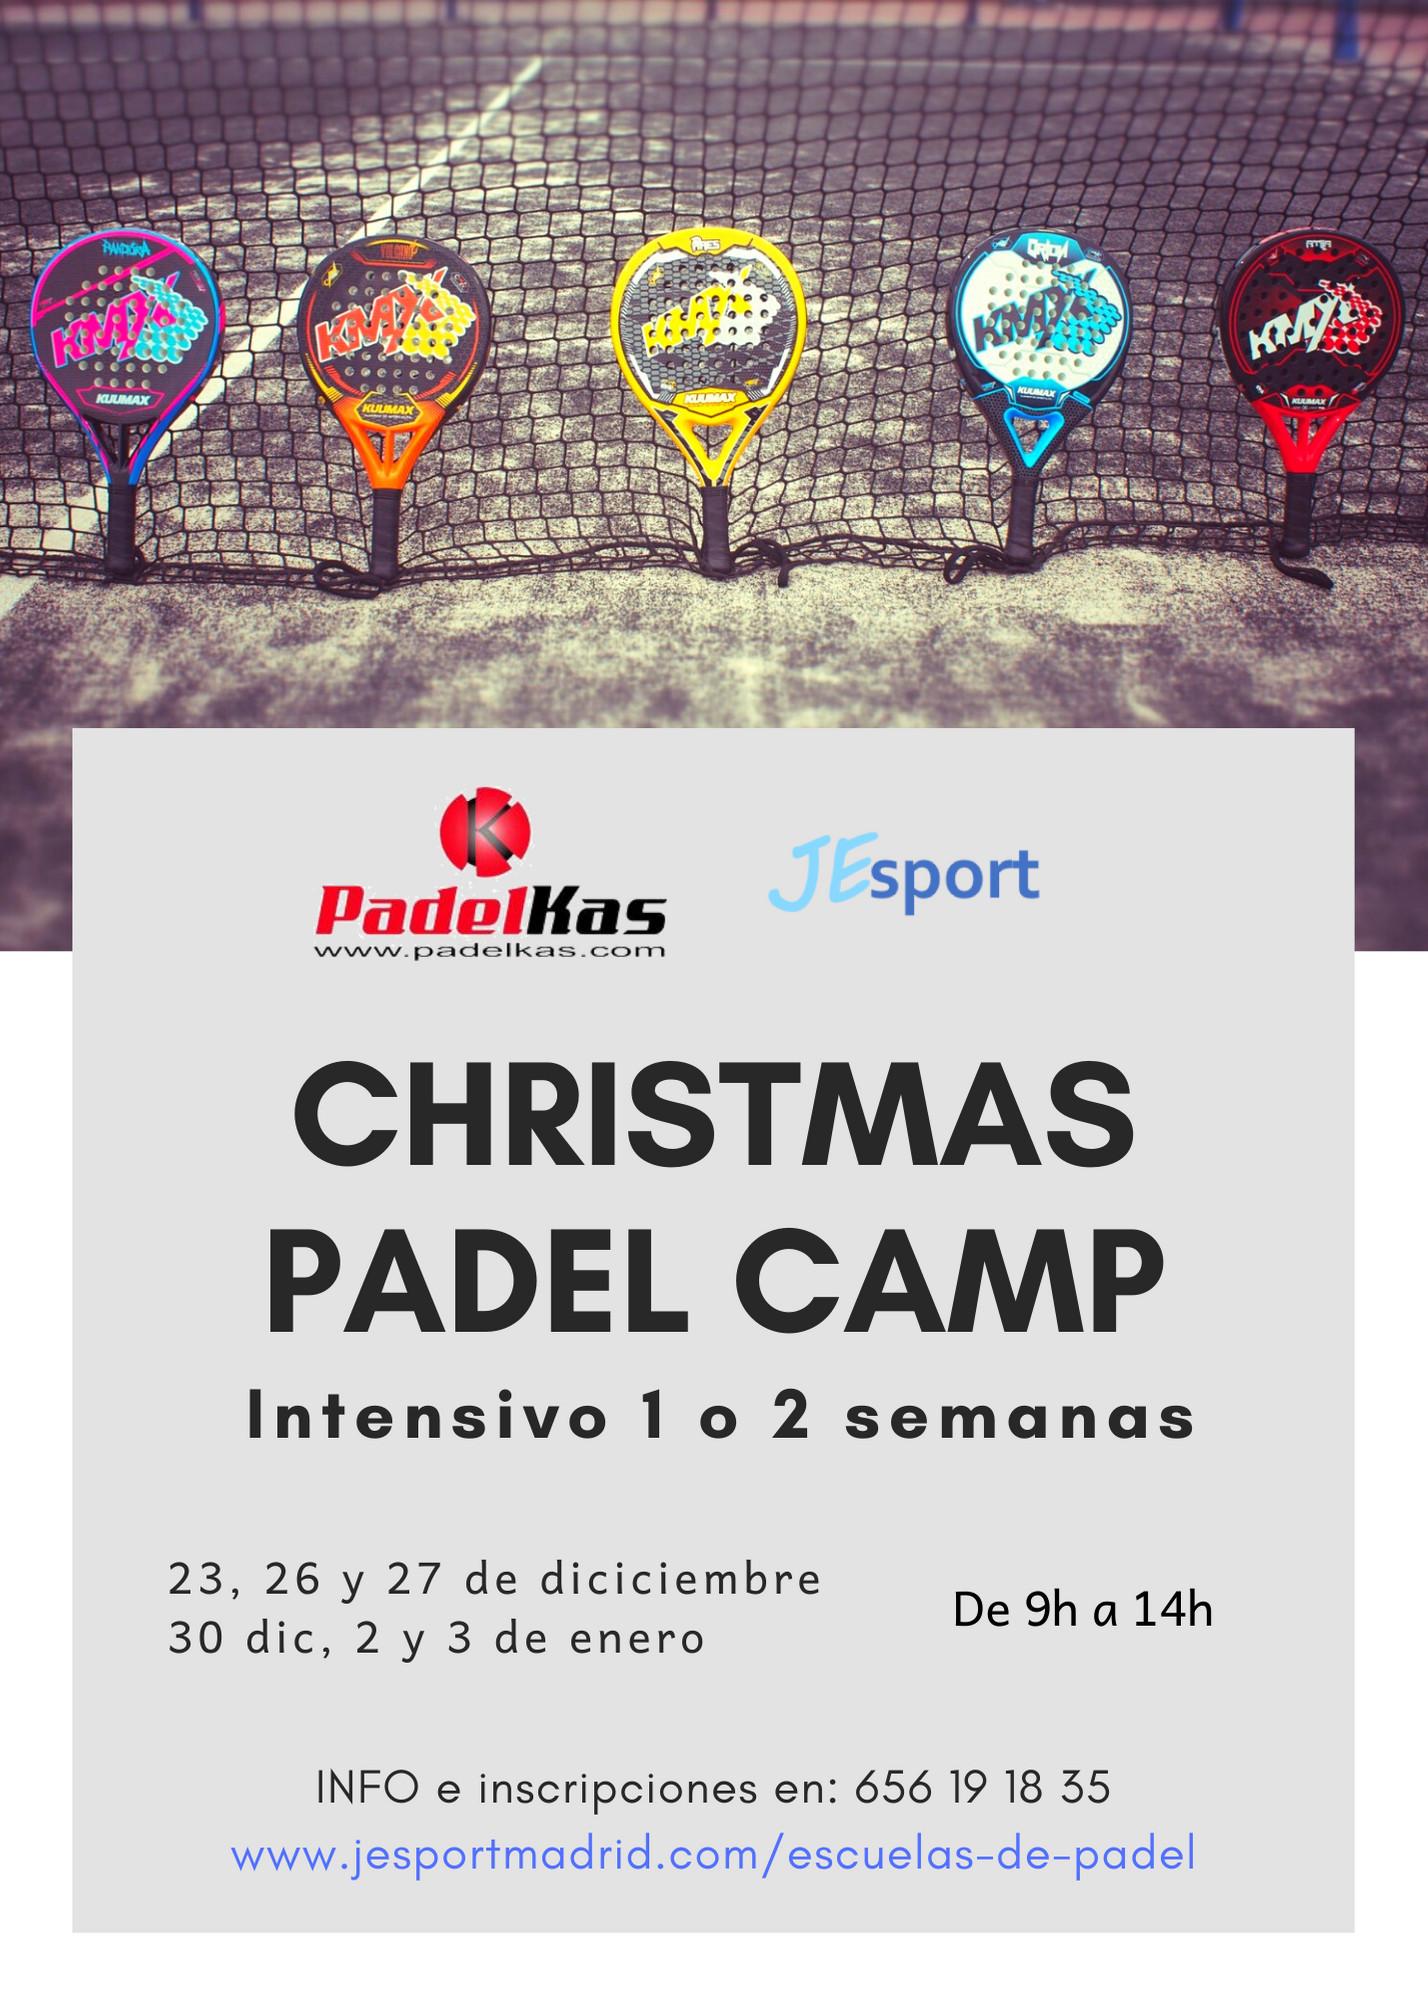 CARTEL PADELKAS Jesport Madrid